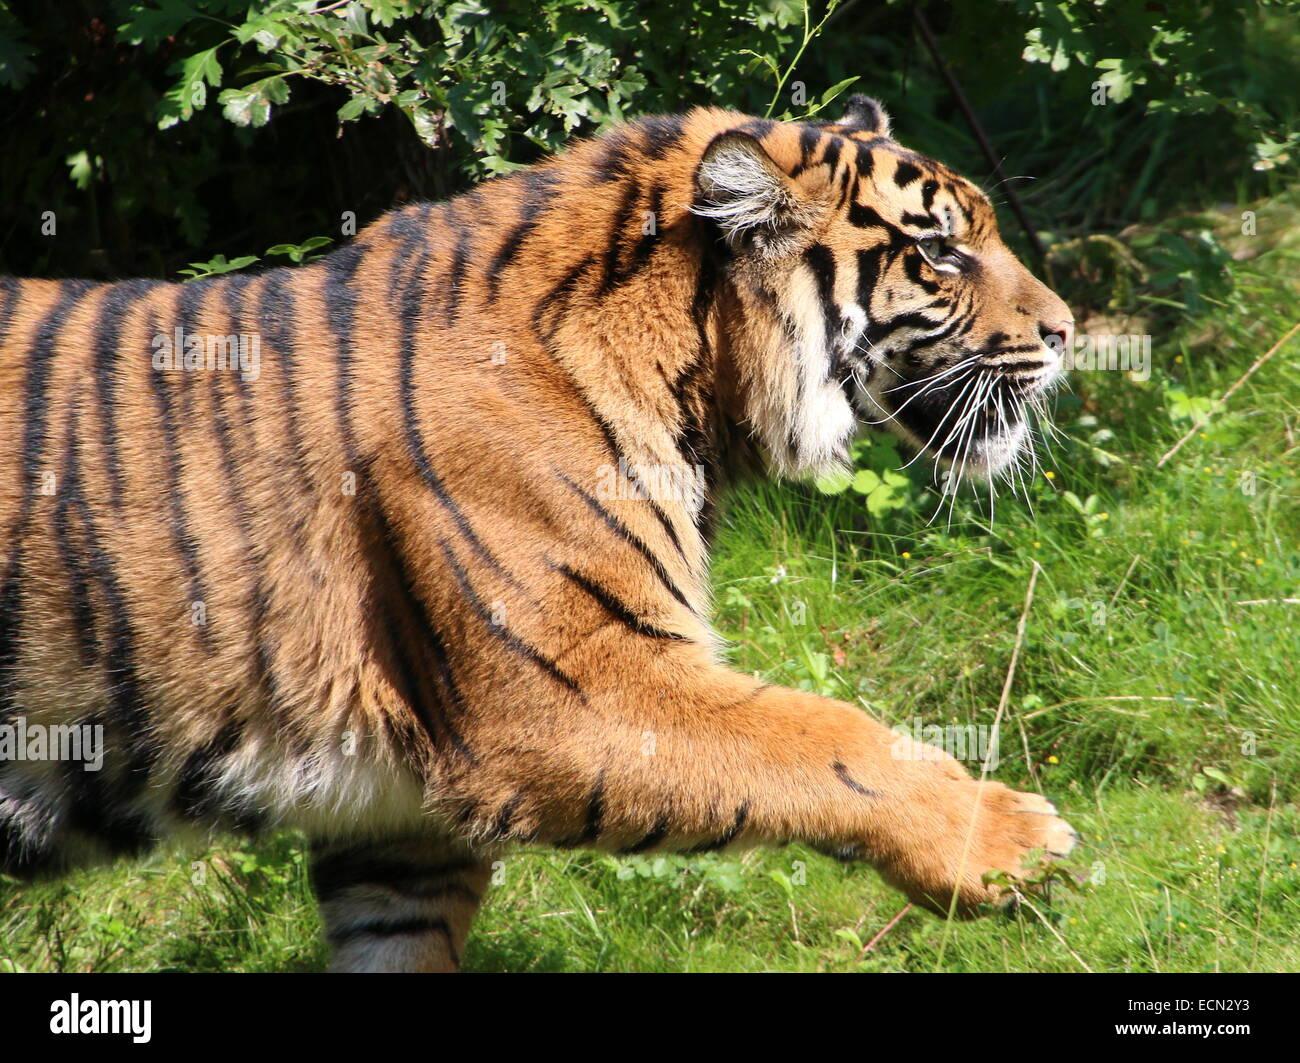 Snarling male Sumatran tiger (Panthera tigris sumatrae) walking by at close range, paw lifted in the air - Stock Image